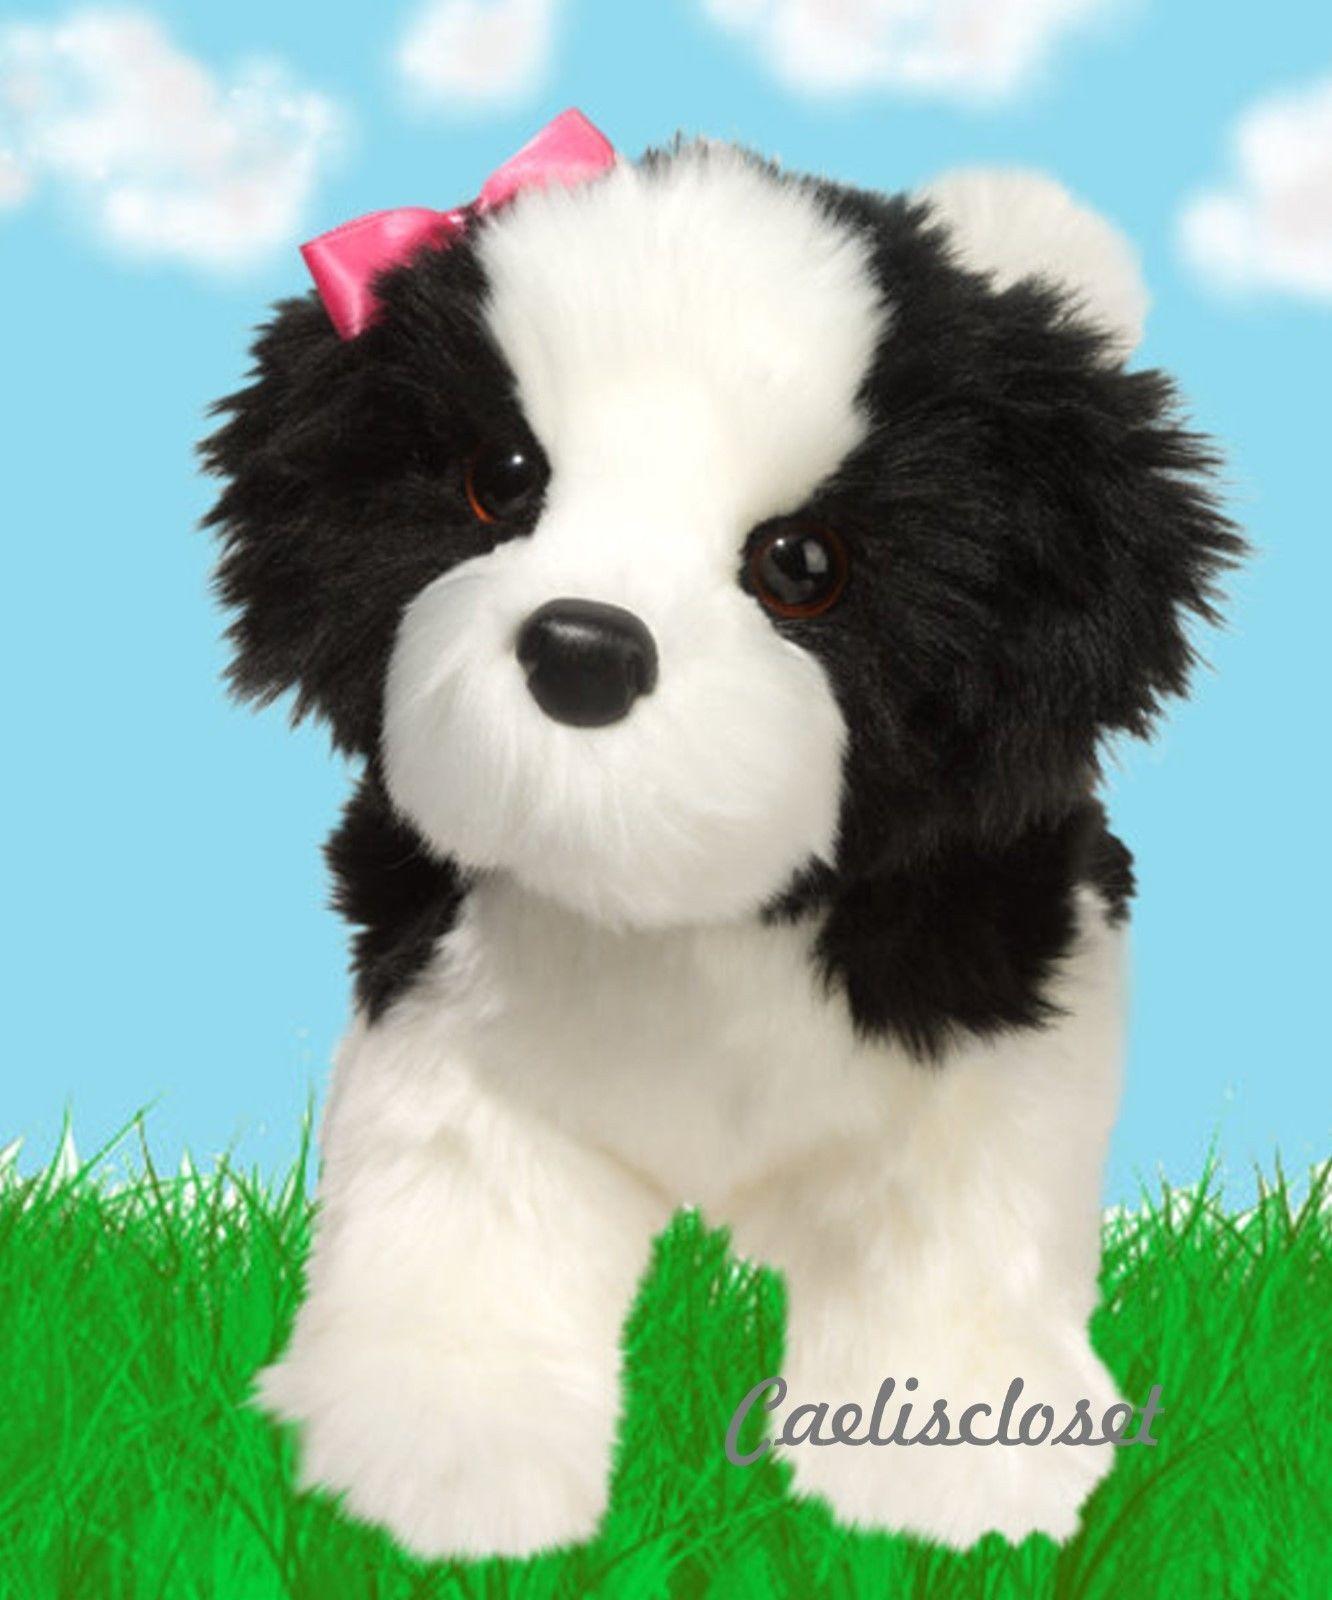 Douglas Poofy Black White Shih Tzu 10 Plush Stuffed Animal Puppy